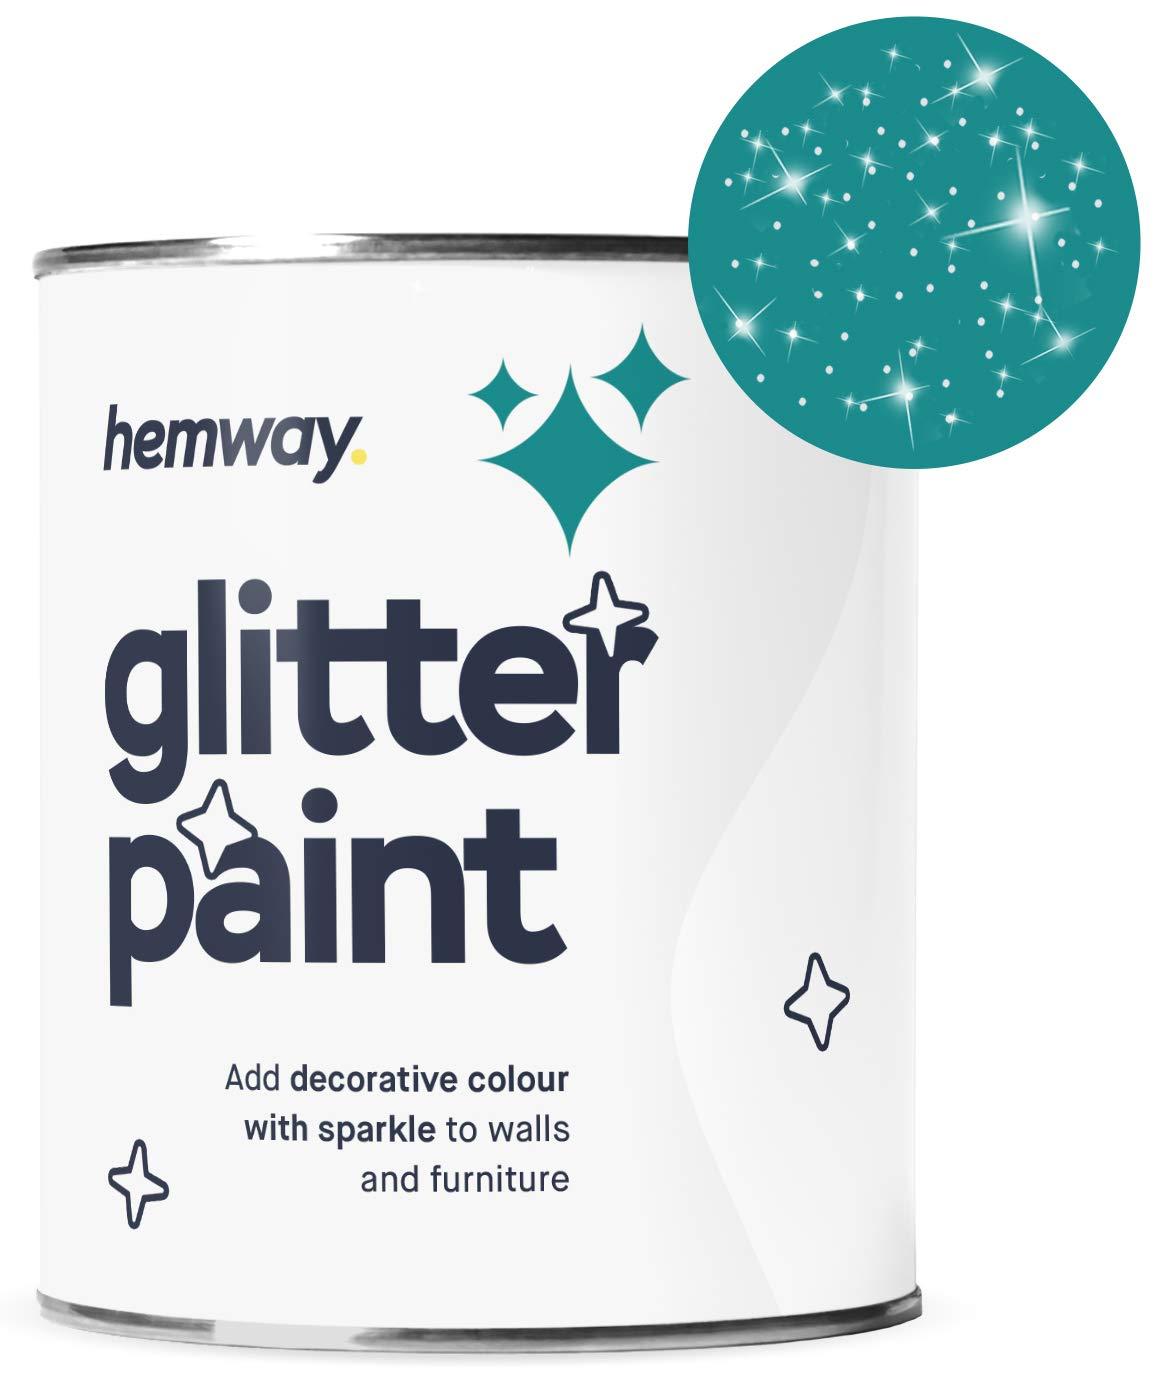 Hemway Silver Glitter Paint 1L Matte Walls Wallpaper Bathroom Furniture Acrylic Latex (Peacock Blue)